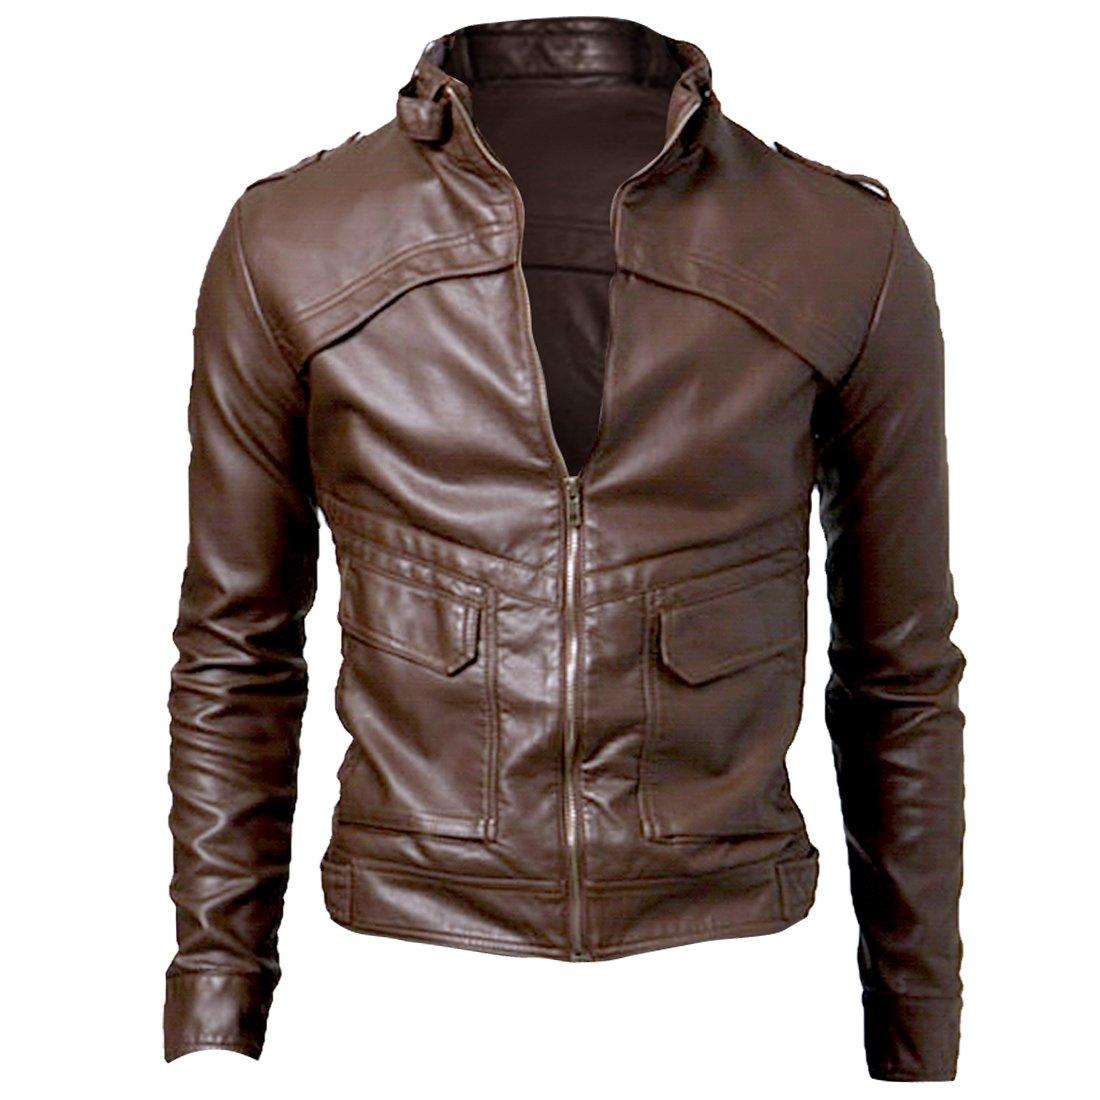 Мужская верхняя одежда из кожи и замши Allegra K Men's Stand Collar Button-Tab Faux Leather Jacket